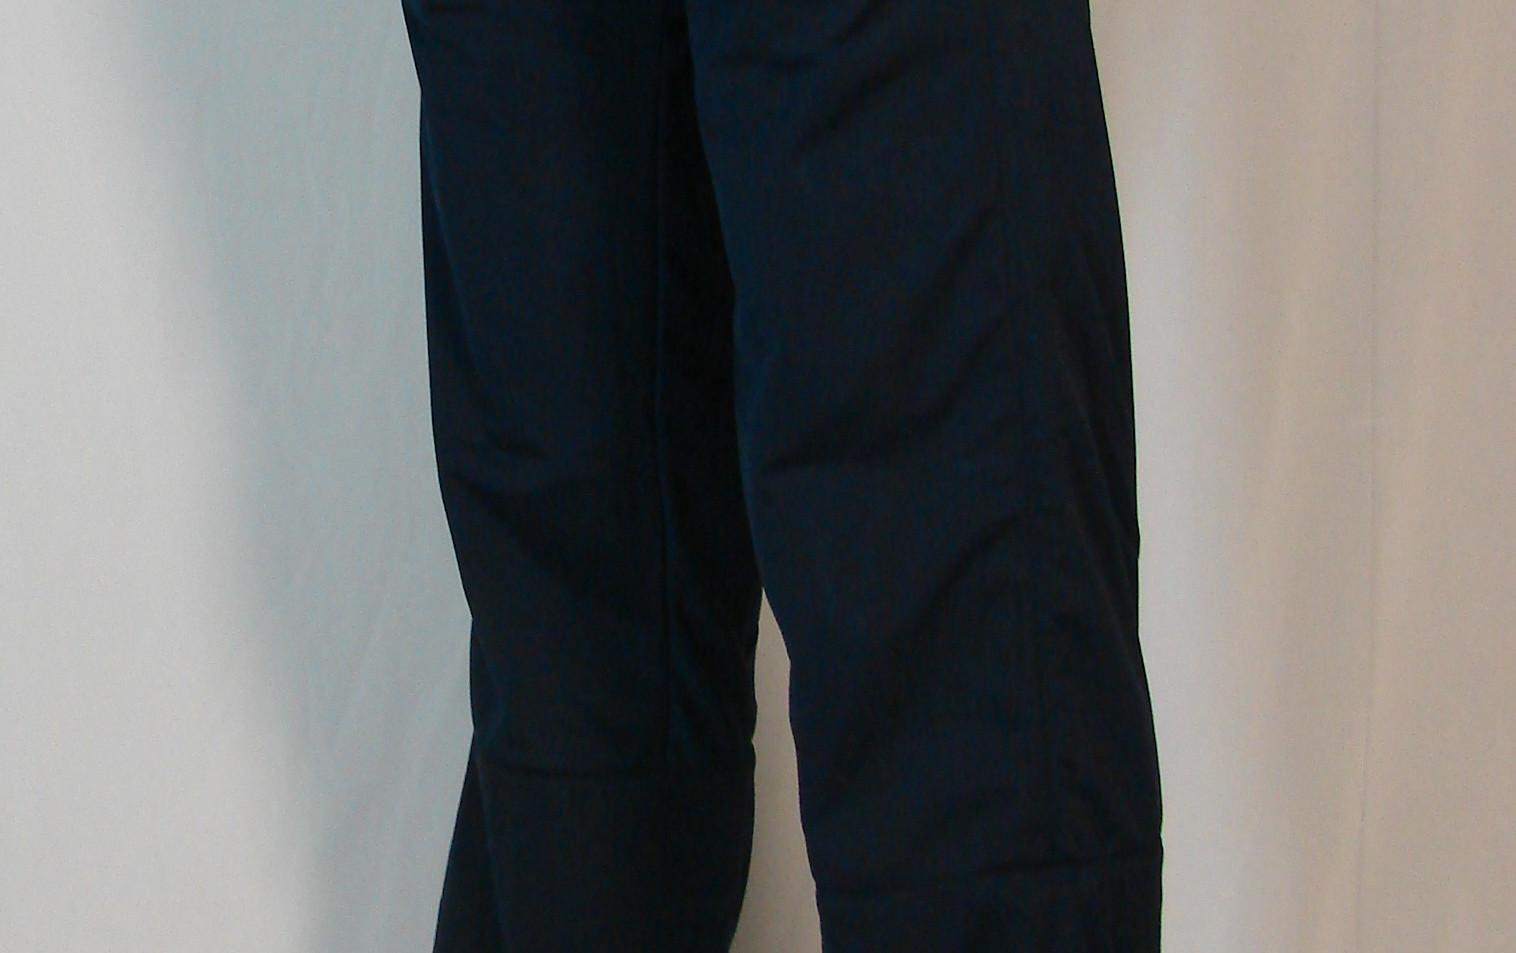 Pantalon jambes droites sportif  - Côté / Straight leg sport pants - Side